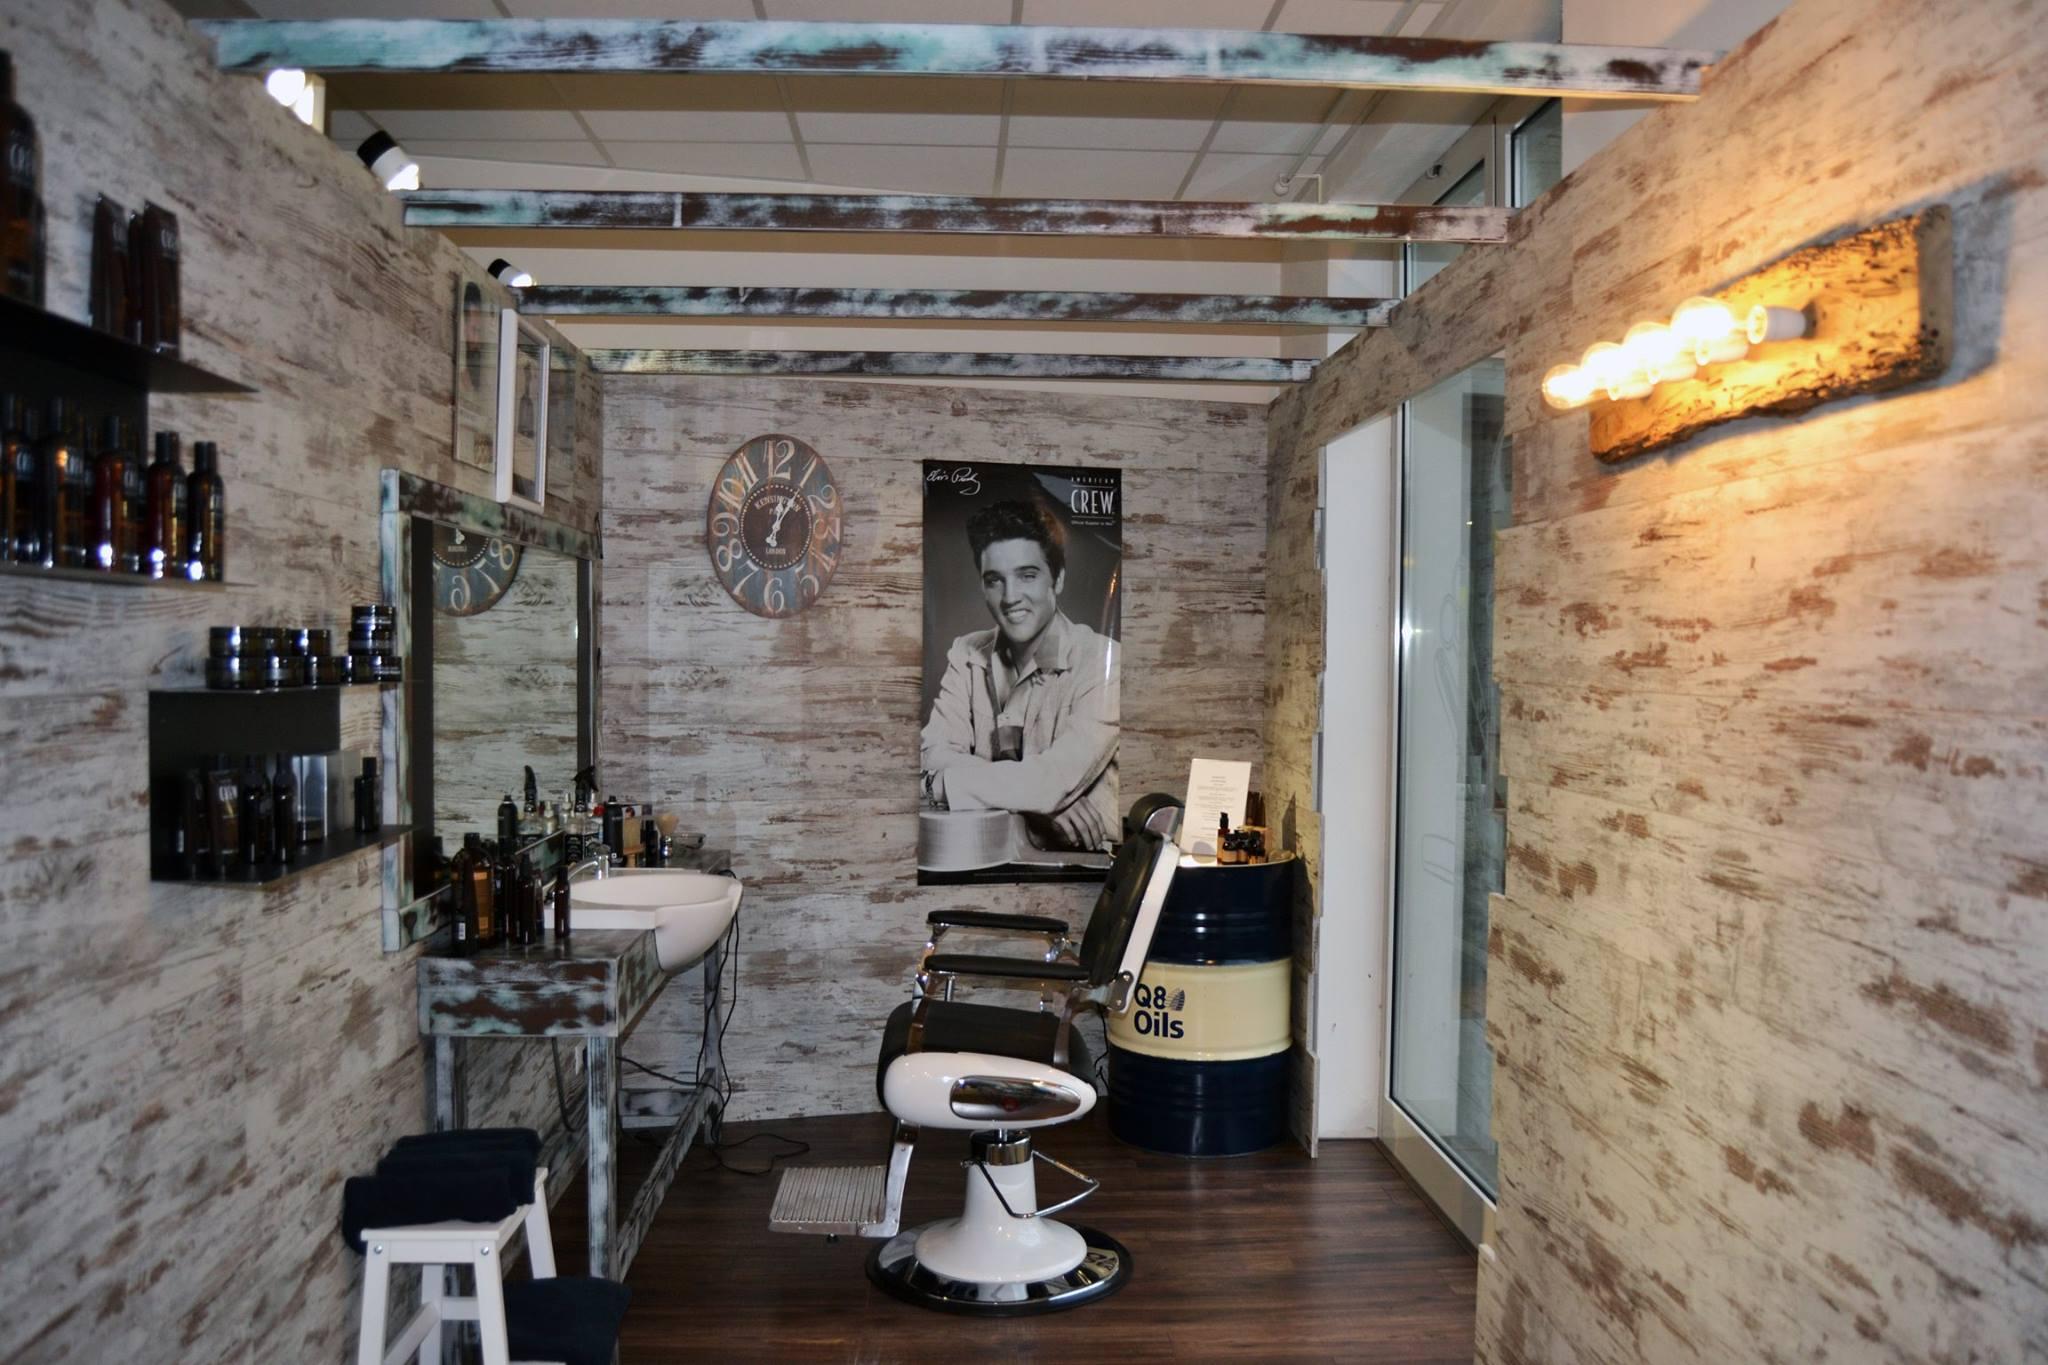 Barber shop atmosfera industrial shabby per questo for Arredamento barber shop